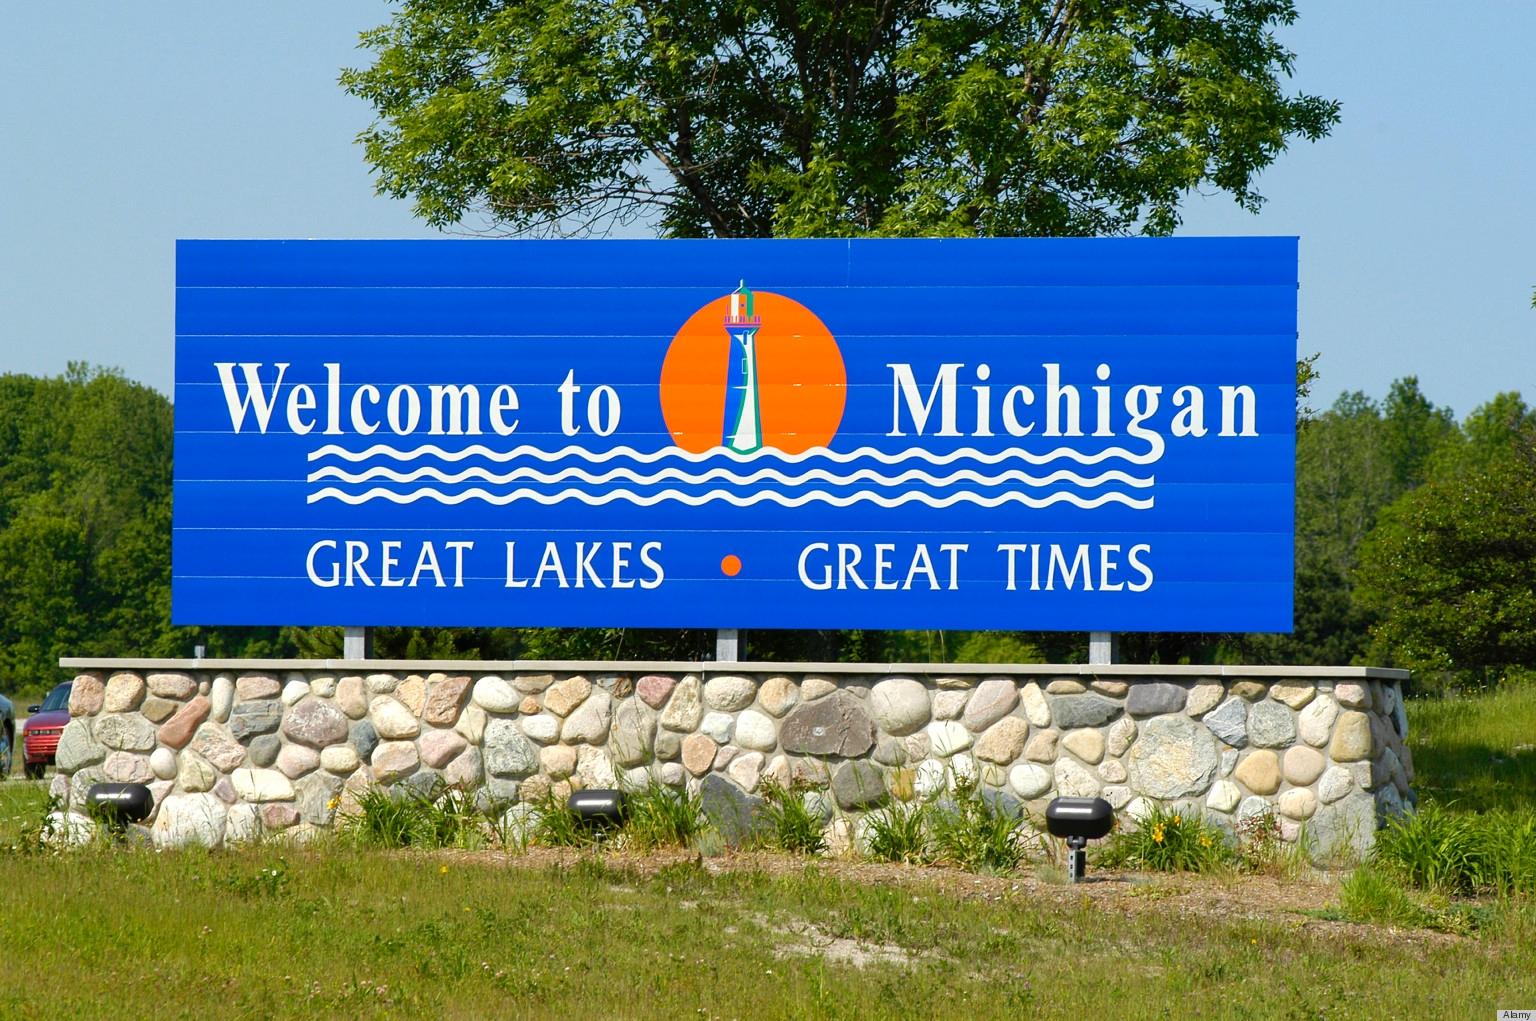 1. Michigan